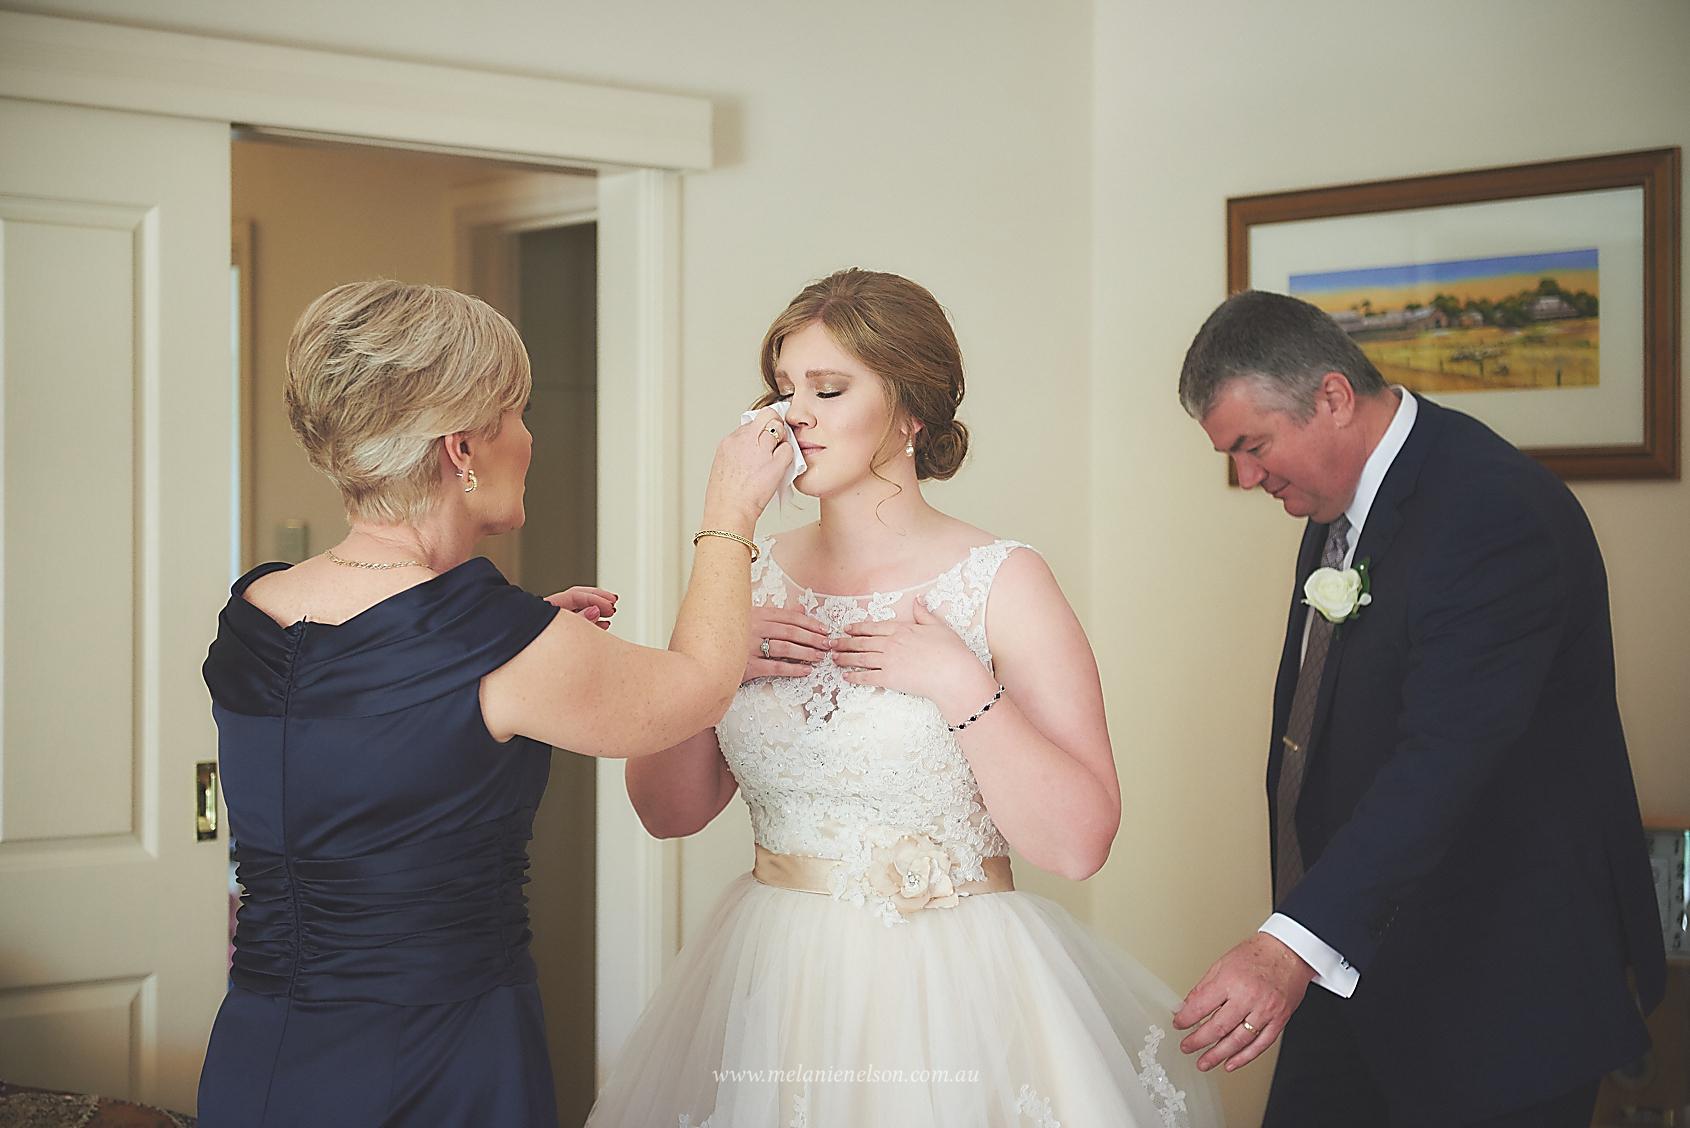 yorke_peninsula_wedding_photographer_0010.jpg